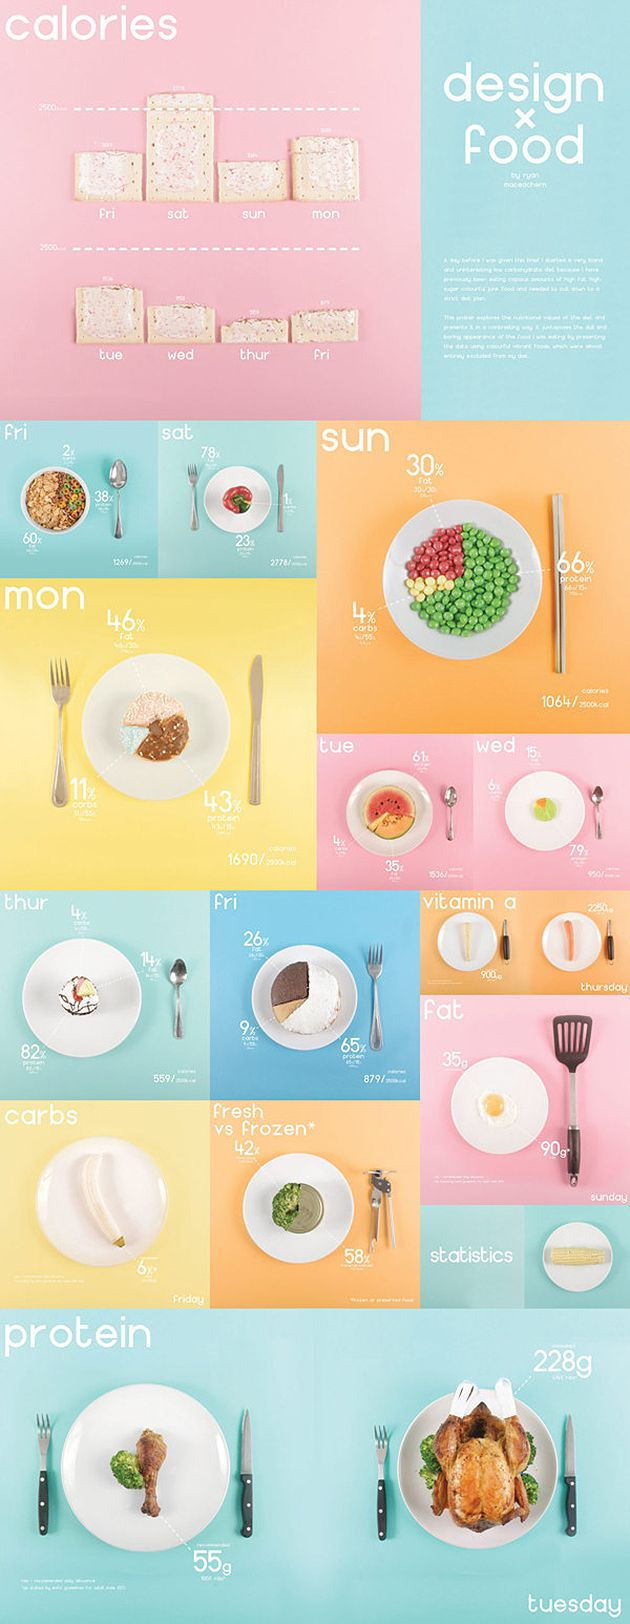 KlonBlog - Diätenkoller und Frustabbau